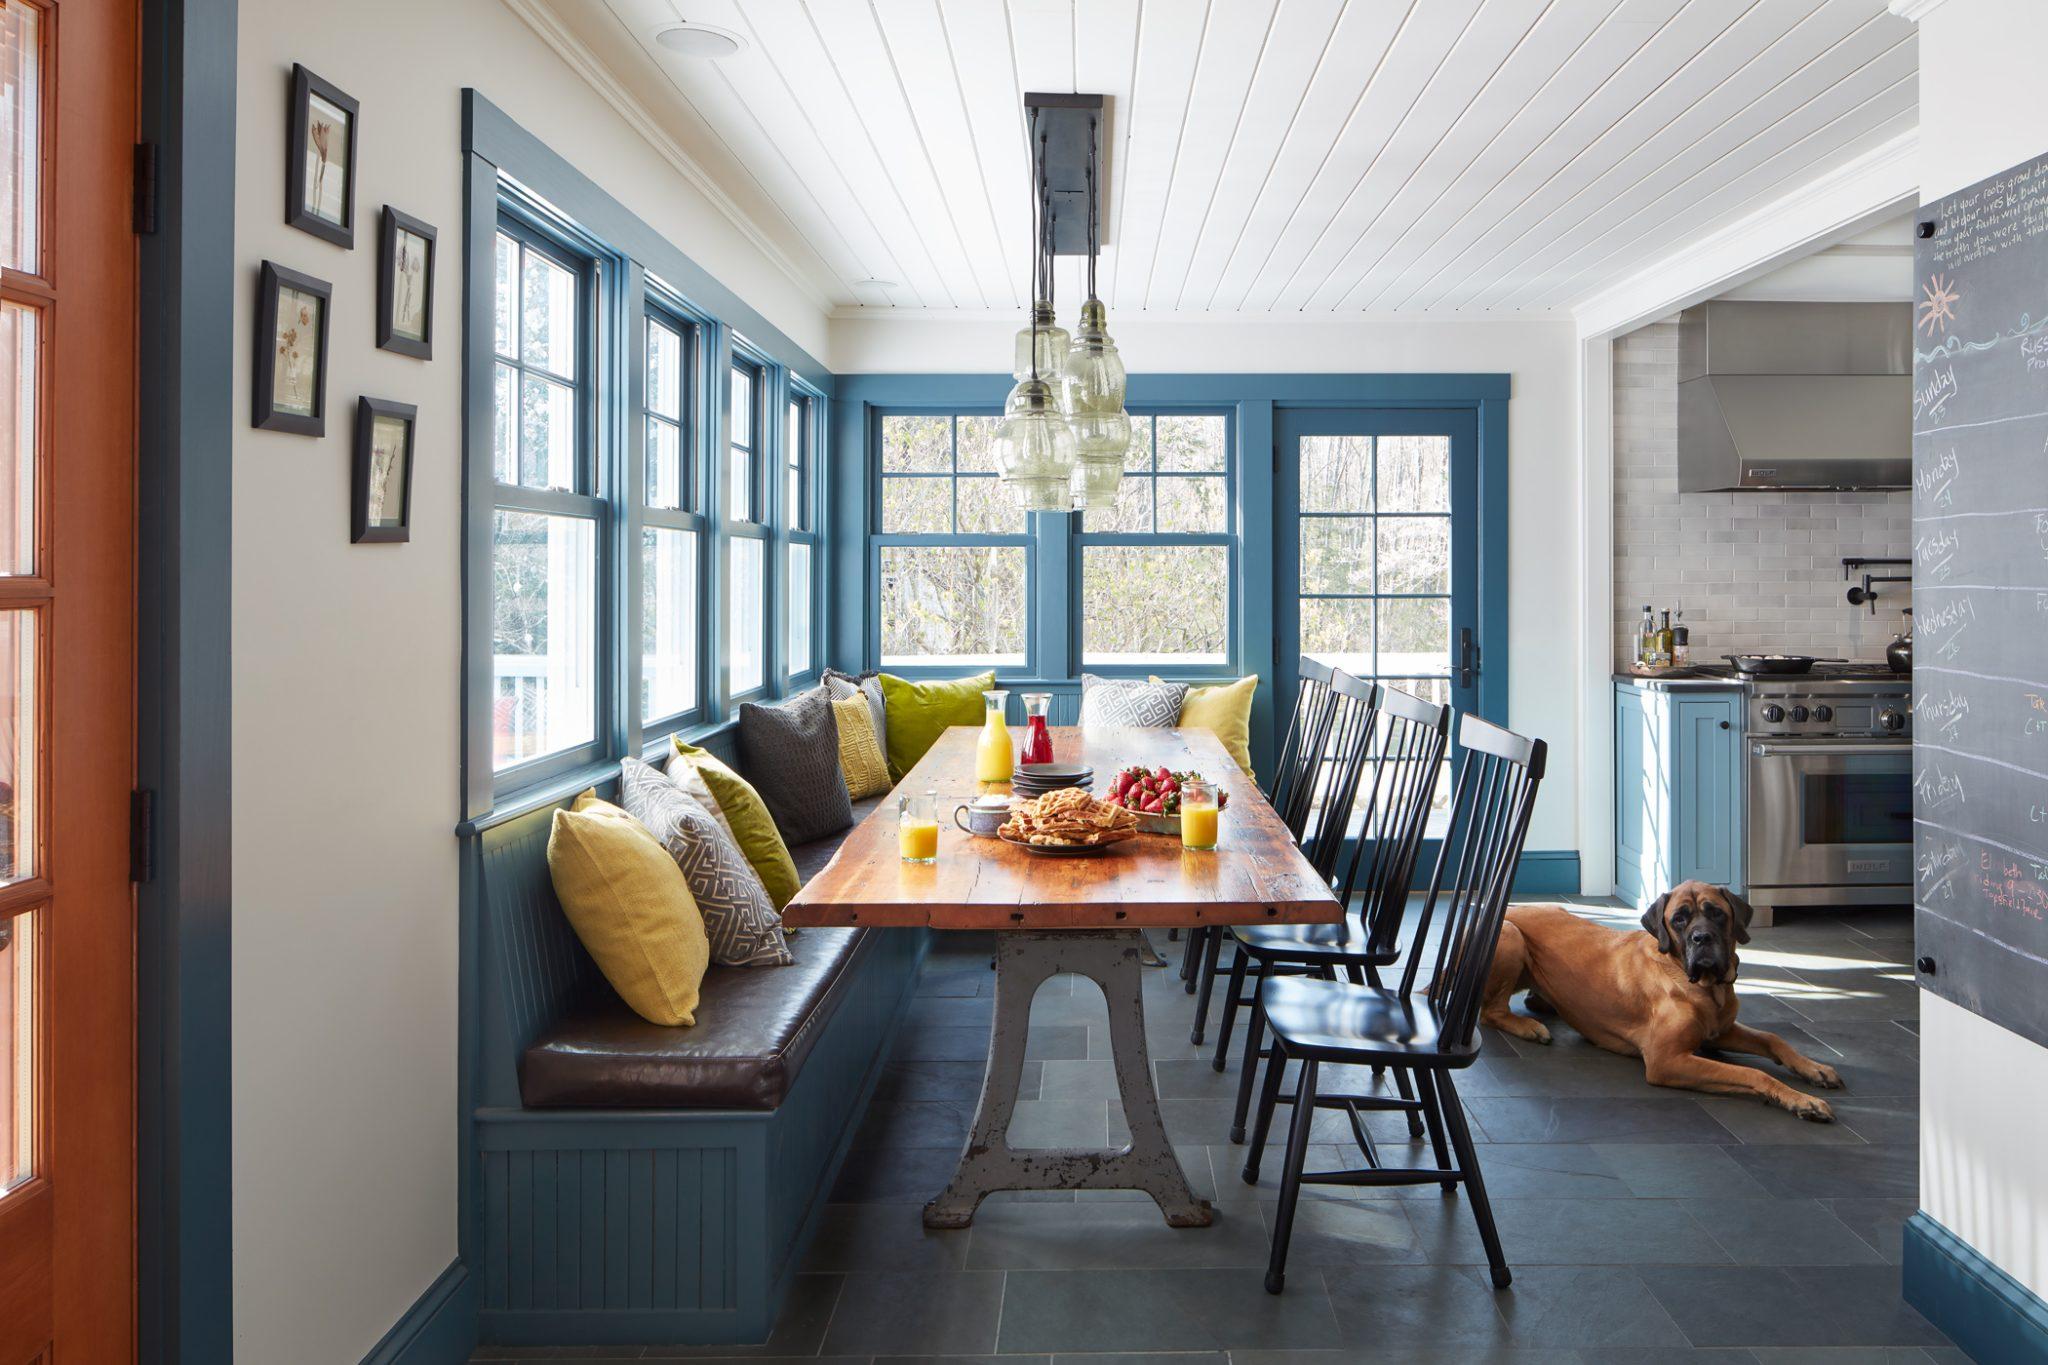 Essex farmhouse kitchen by Kristina Crestin Design